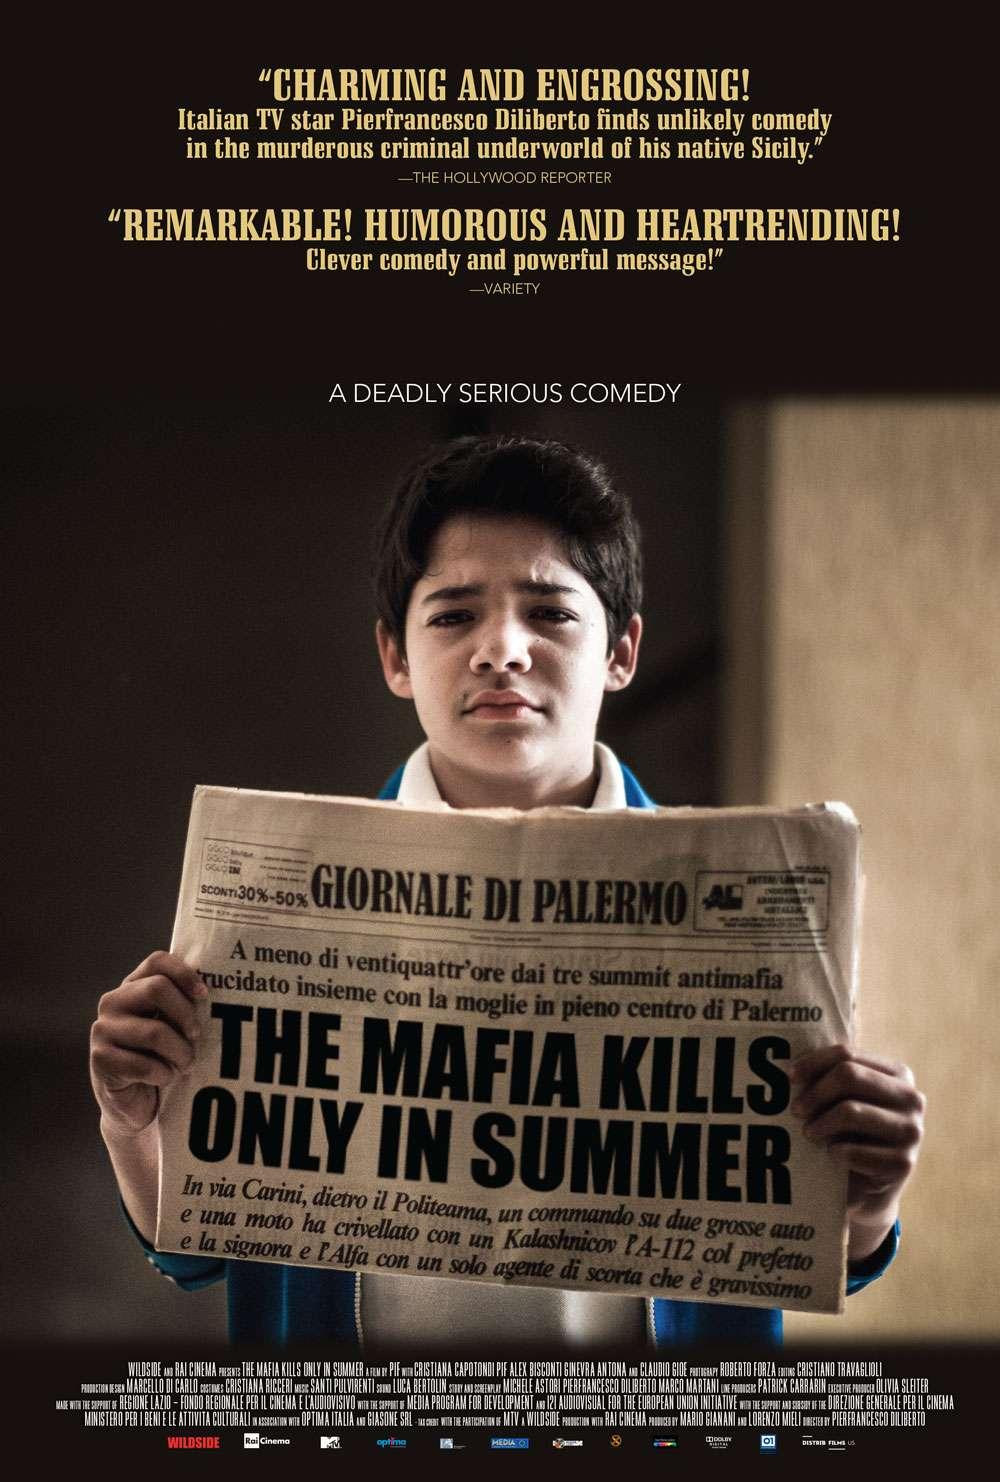 The Mafia Kills Only in Summer kapak